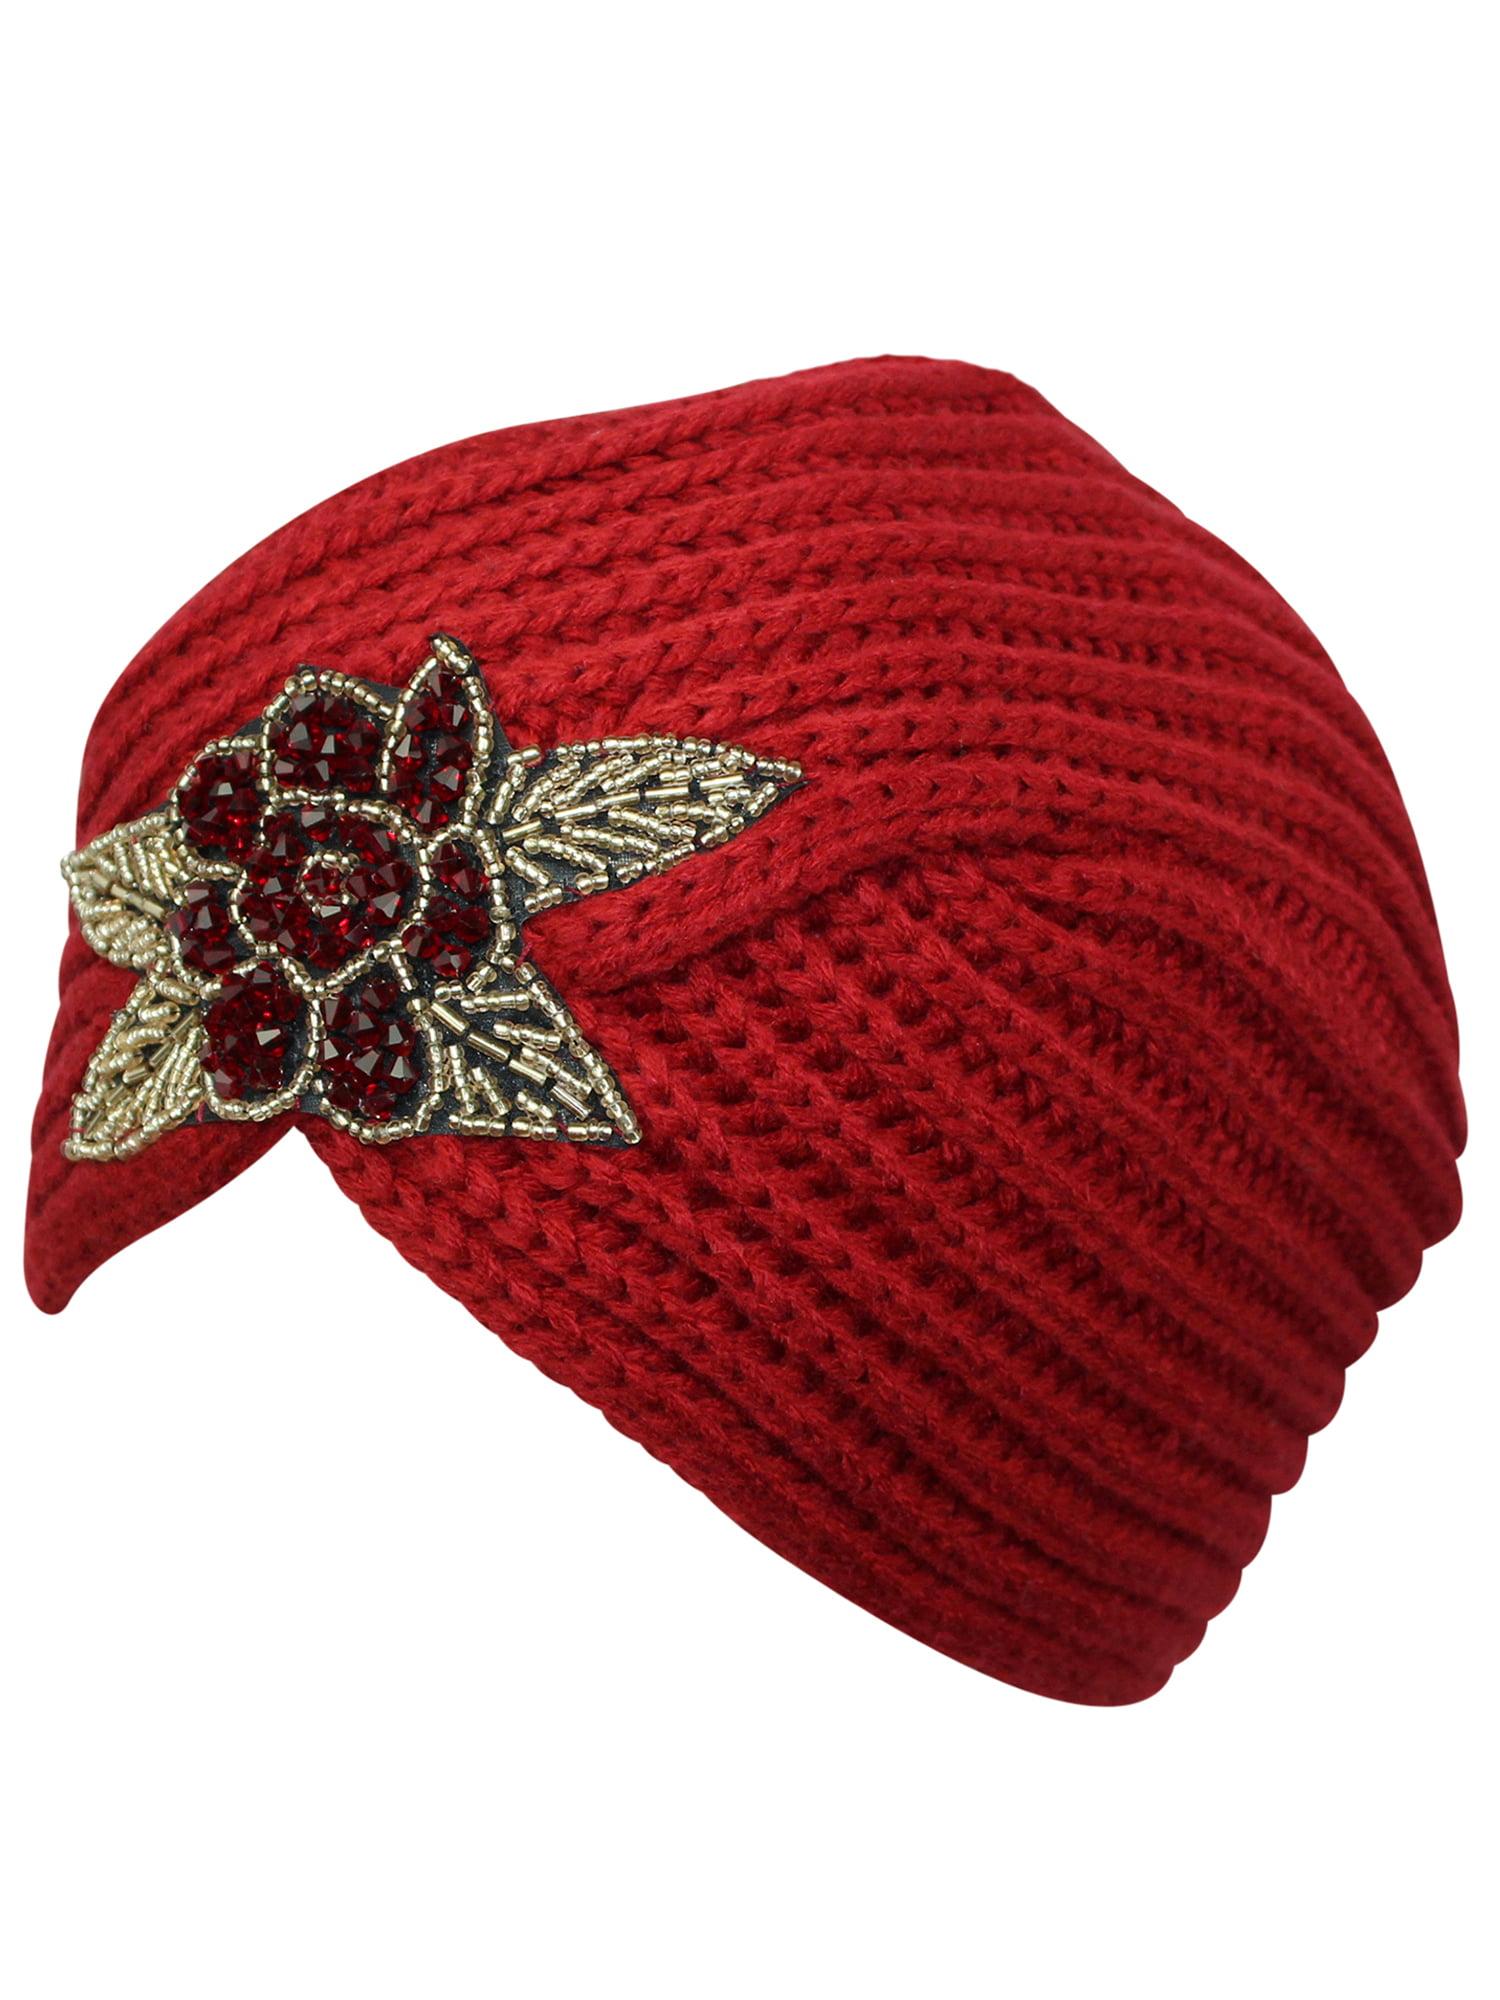 85a0e00b898 Luxury Divas - Winter Knit Turban Beanie With Beaded Flower - Walmart.com